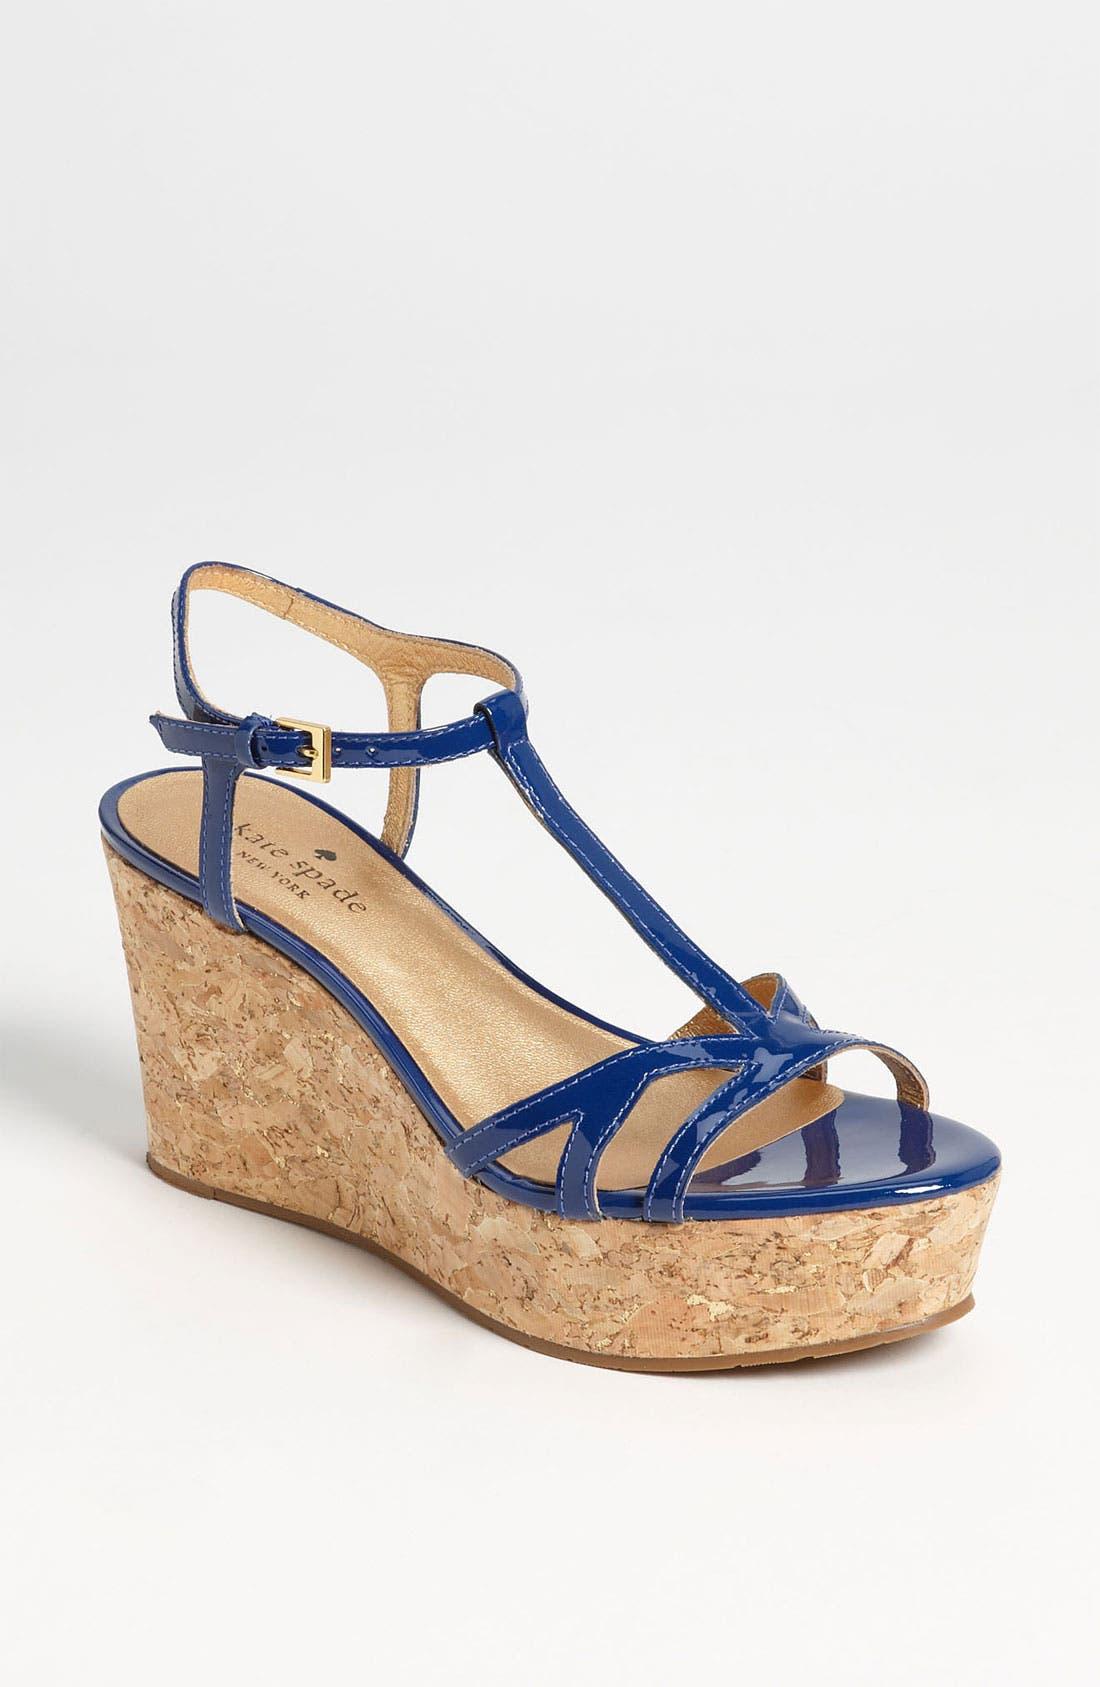 Alternate Image 1 Selected - kate spade new york 'theodora' sandal